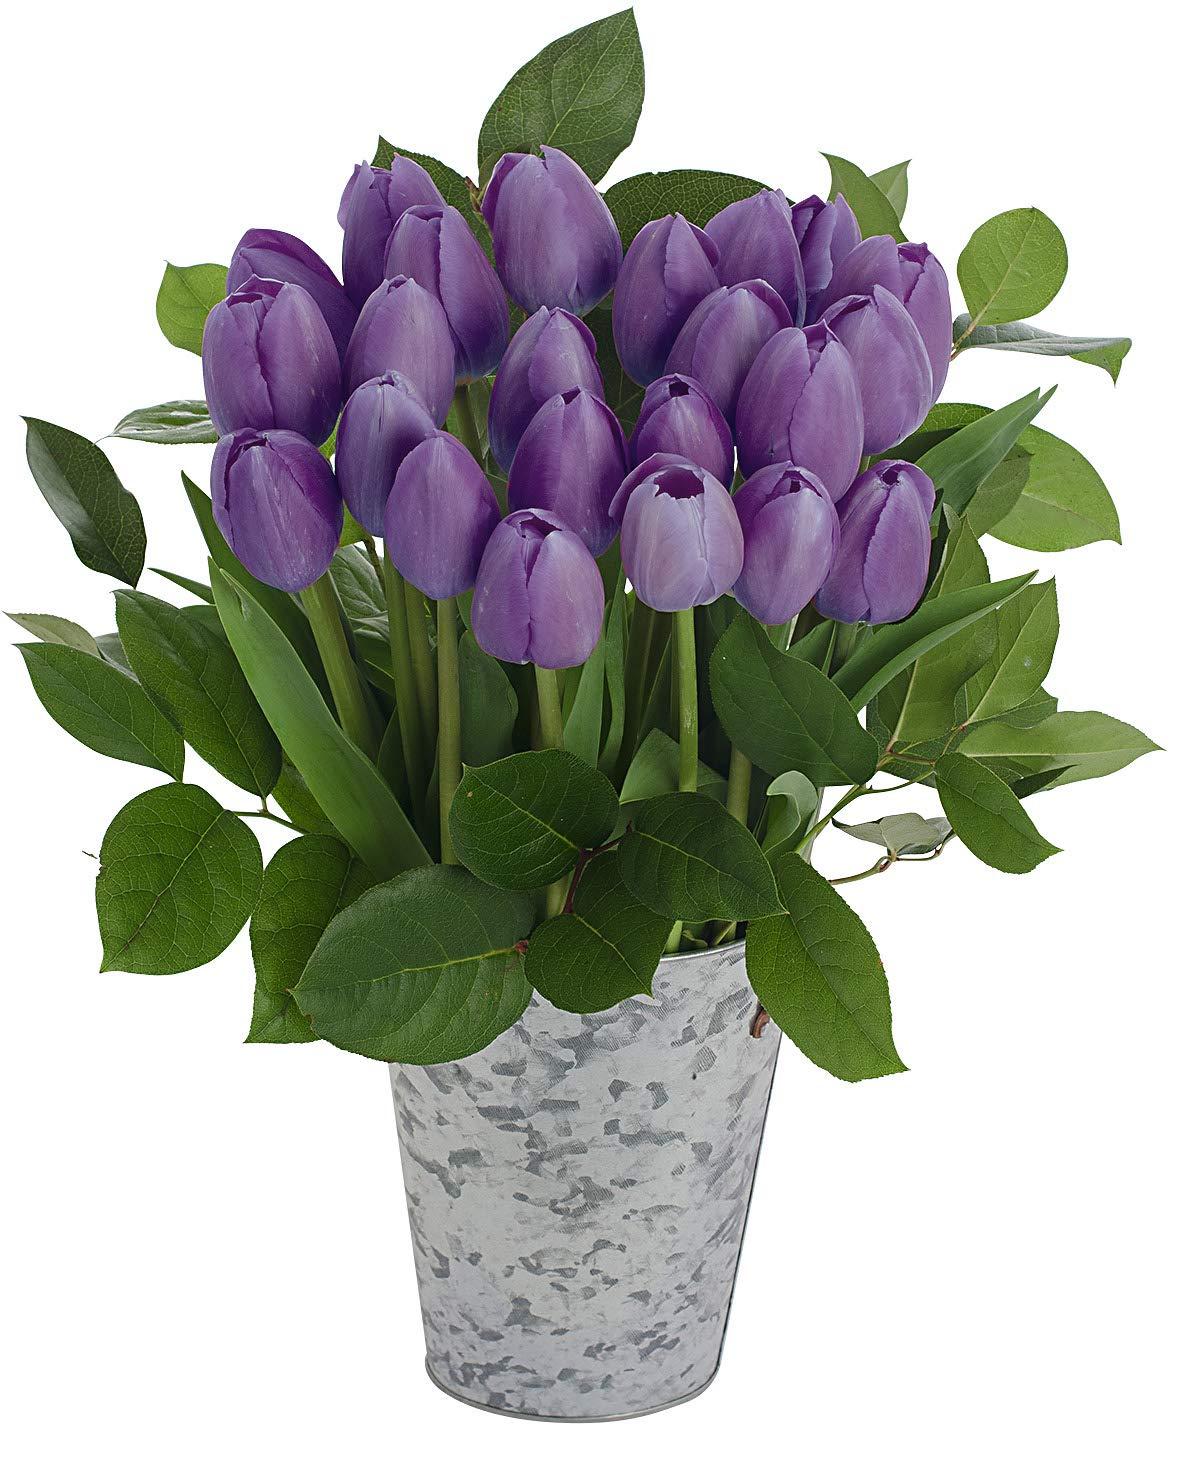 Stargazer Barn Dynasty Bouquet 2 Dozen Purple Tulips with French Bucket Style Vase by Stargazer Barn